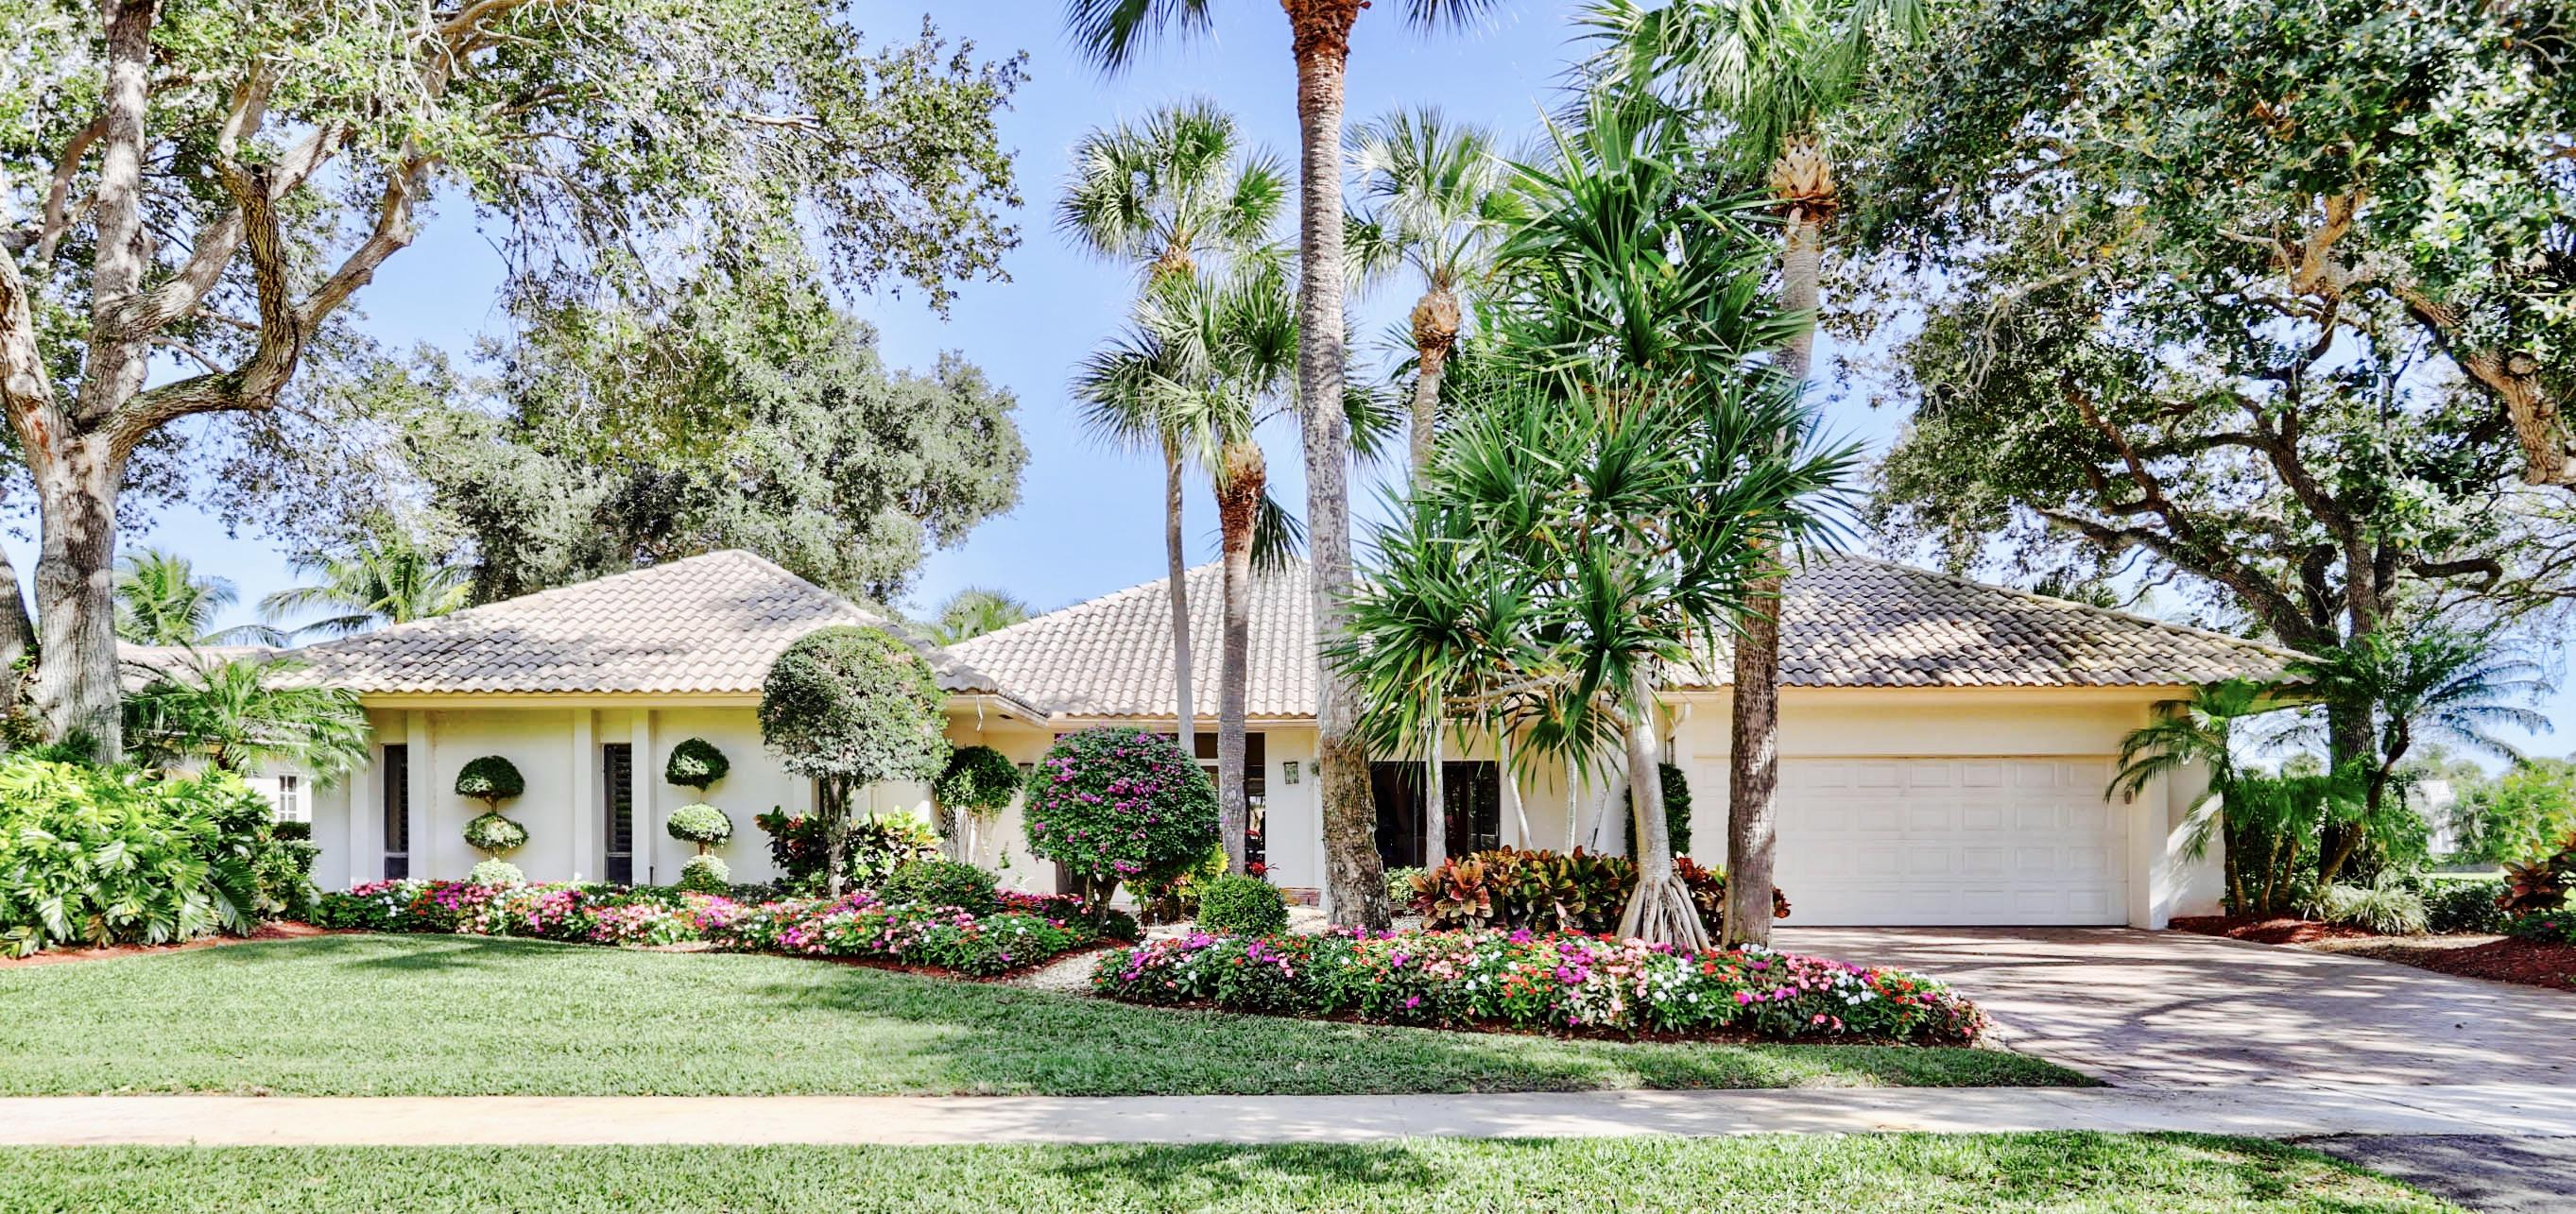 4167 Live Oak Boulevard, Delray Beach, Florida 33445, 3 Bedrooms Bedrooms, ,3.1 BathroomsBathrooms,Single Family,For Sale,DELAIRE COUNTRY CLUB,Live Oak,RX-10493988